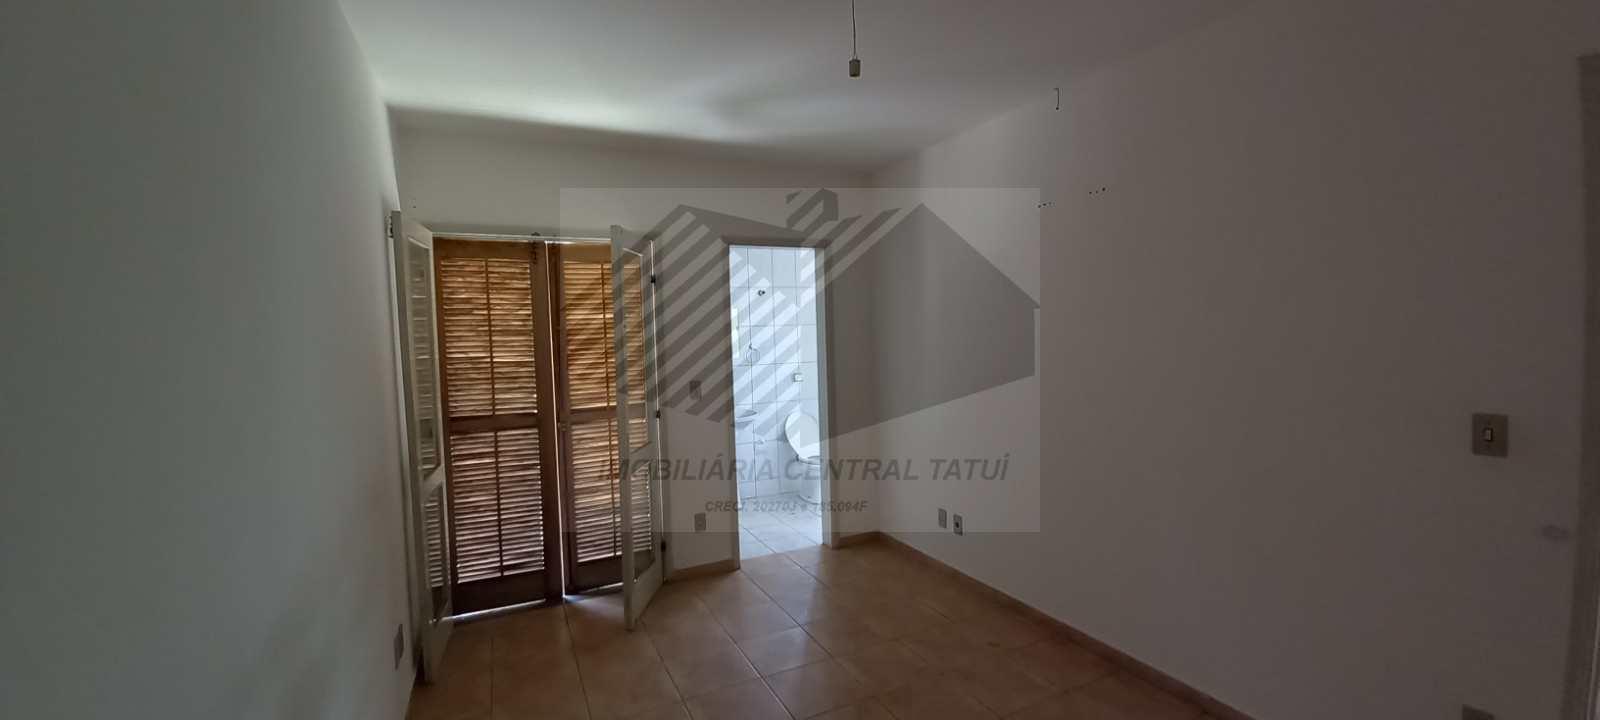 Casa com 3 dorms, Residencial Village Vitória, Tatuí - R$ 230 mil, Cod: 650